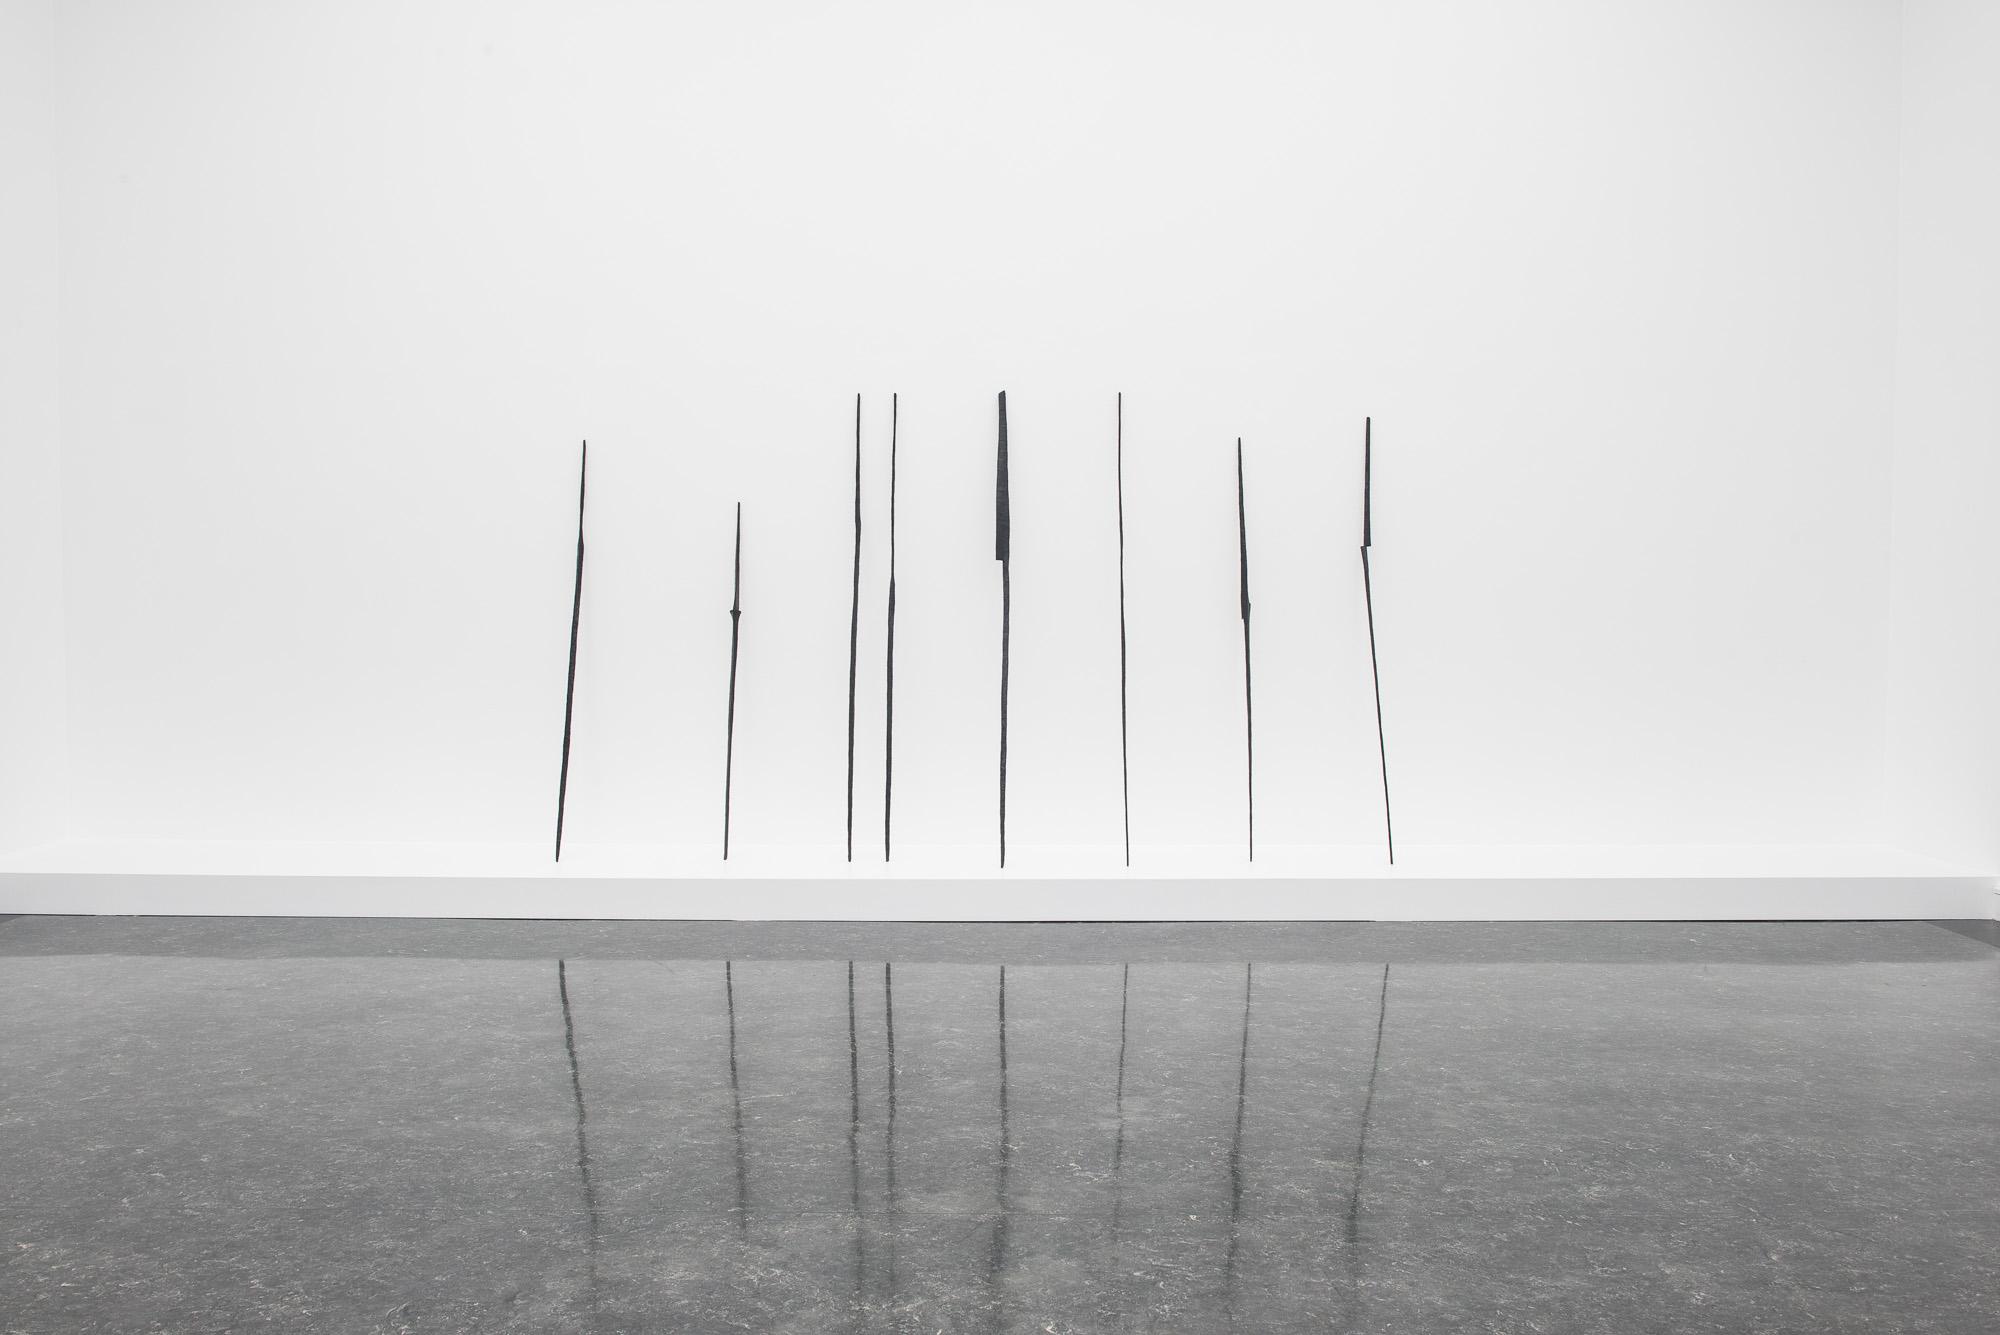 Installation view, Jan Groth, The Festival Exhibition 2017, Bergen Kunsthall, Bergen.Photo courtesy Bergen Kunsthall. Photographer: Thor Brødreskift